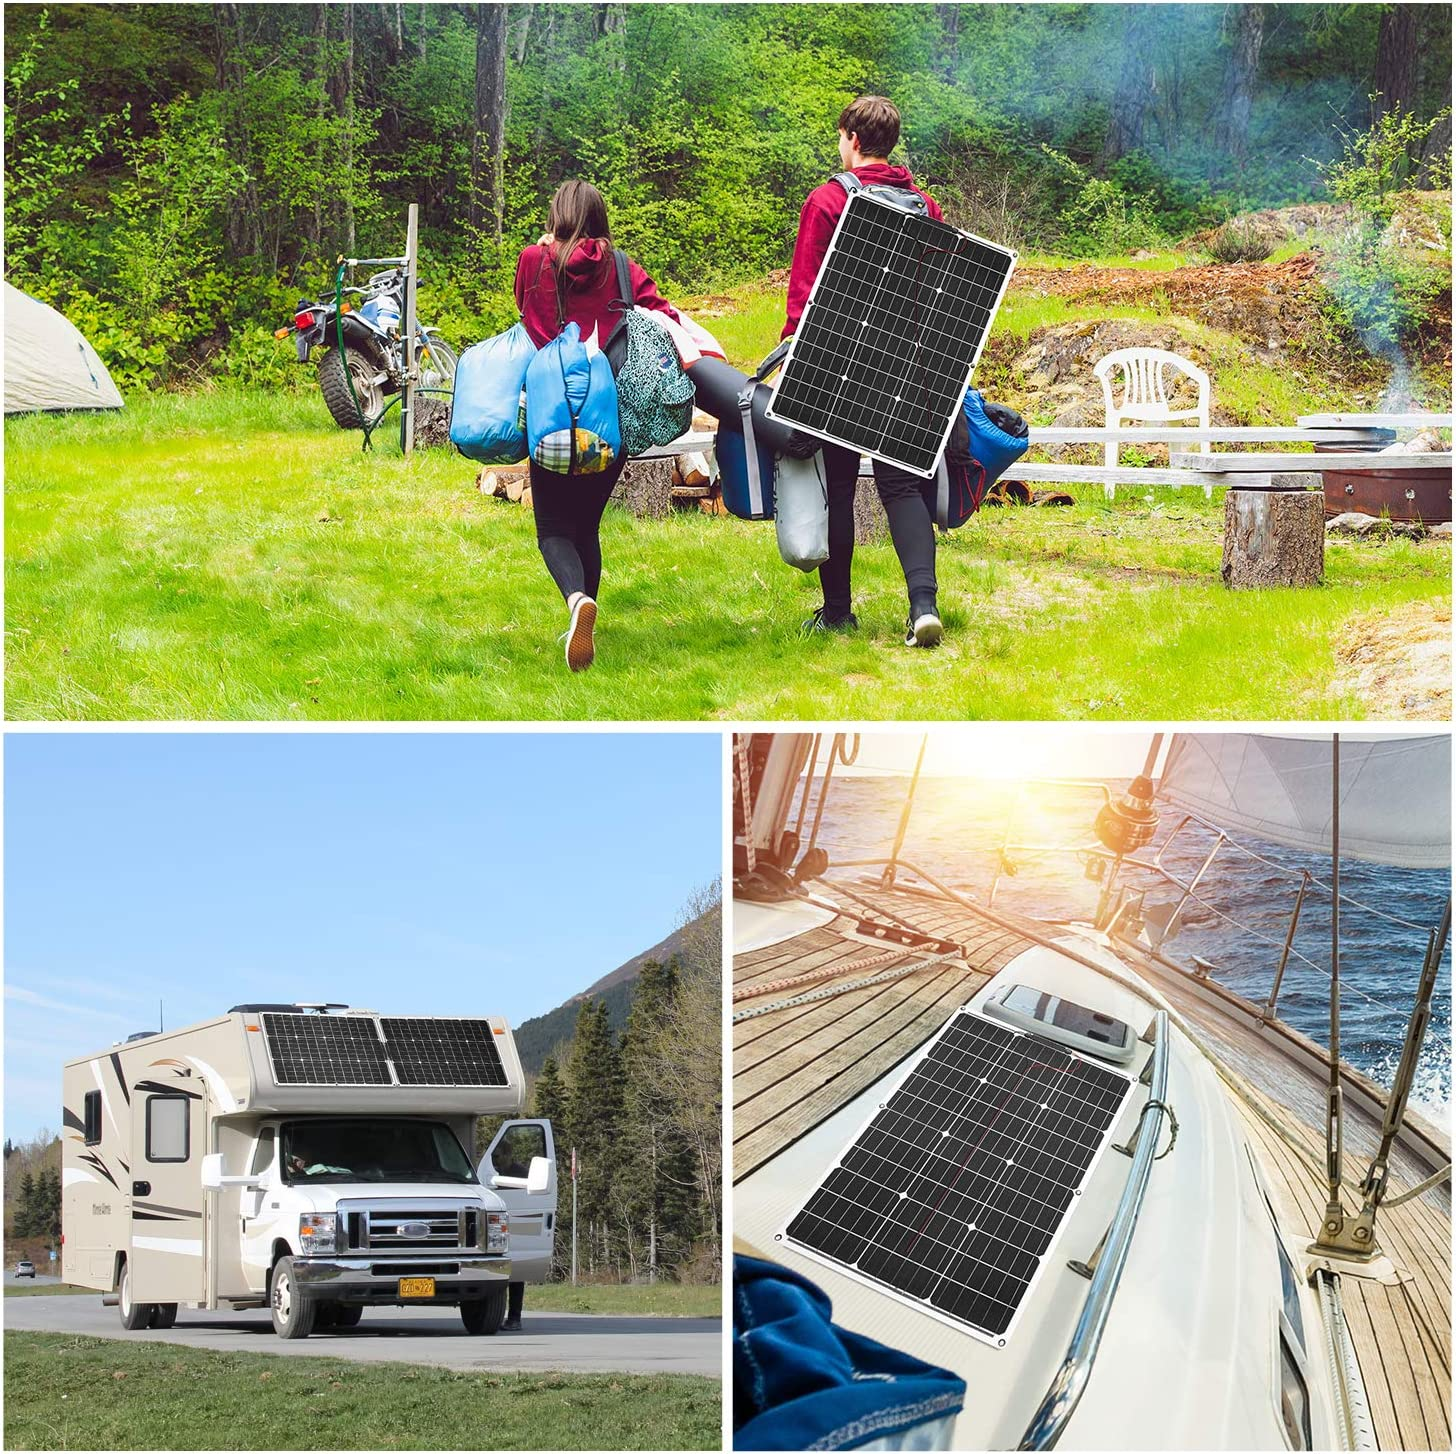 2.6lb with Controller 2 USB Output Highly efficient DOKIO Semi-Flexible Solar Panel 50W 12V Lightweight for Caravan RV Boat Camper Trailer Thin Film Monocrystalline